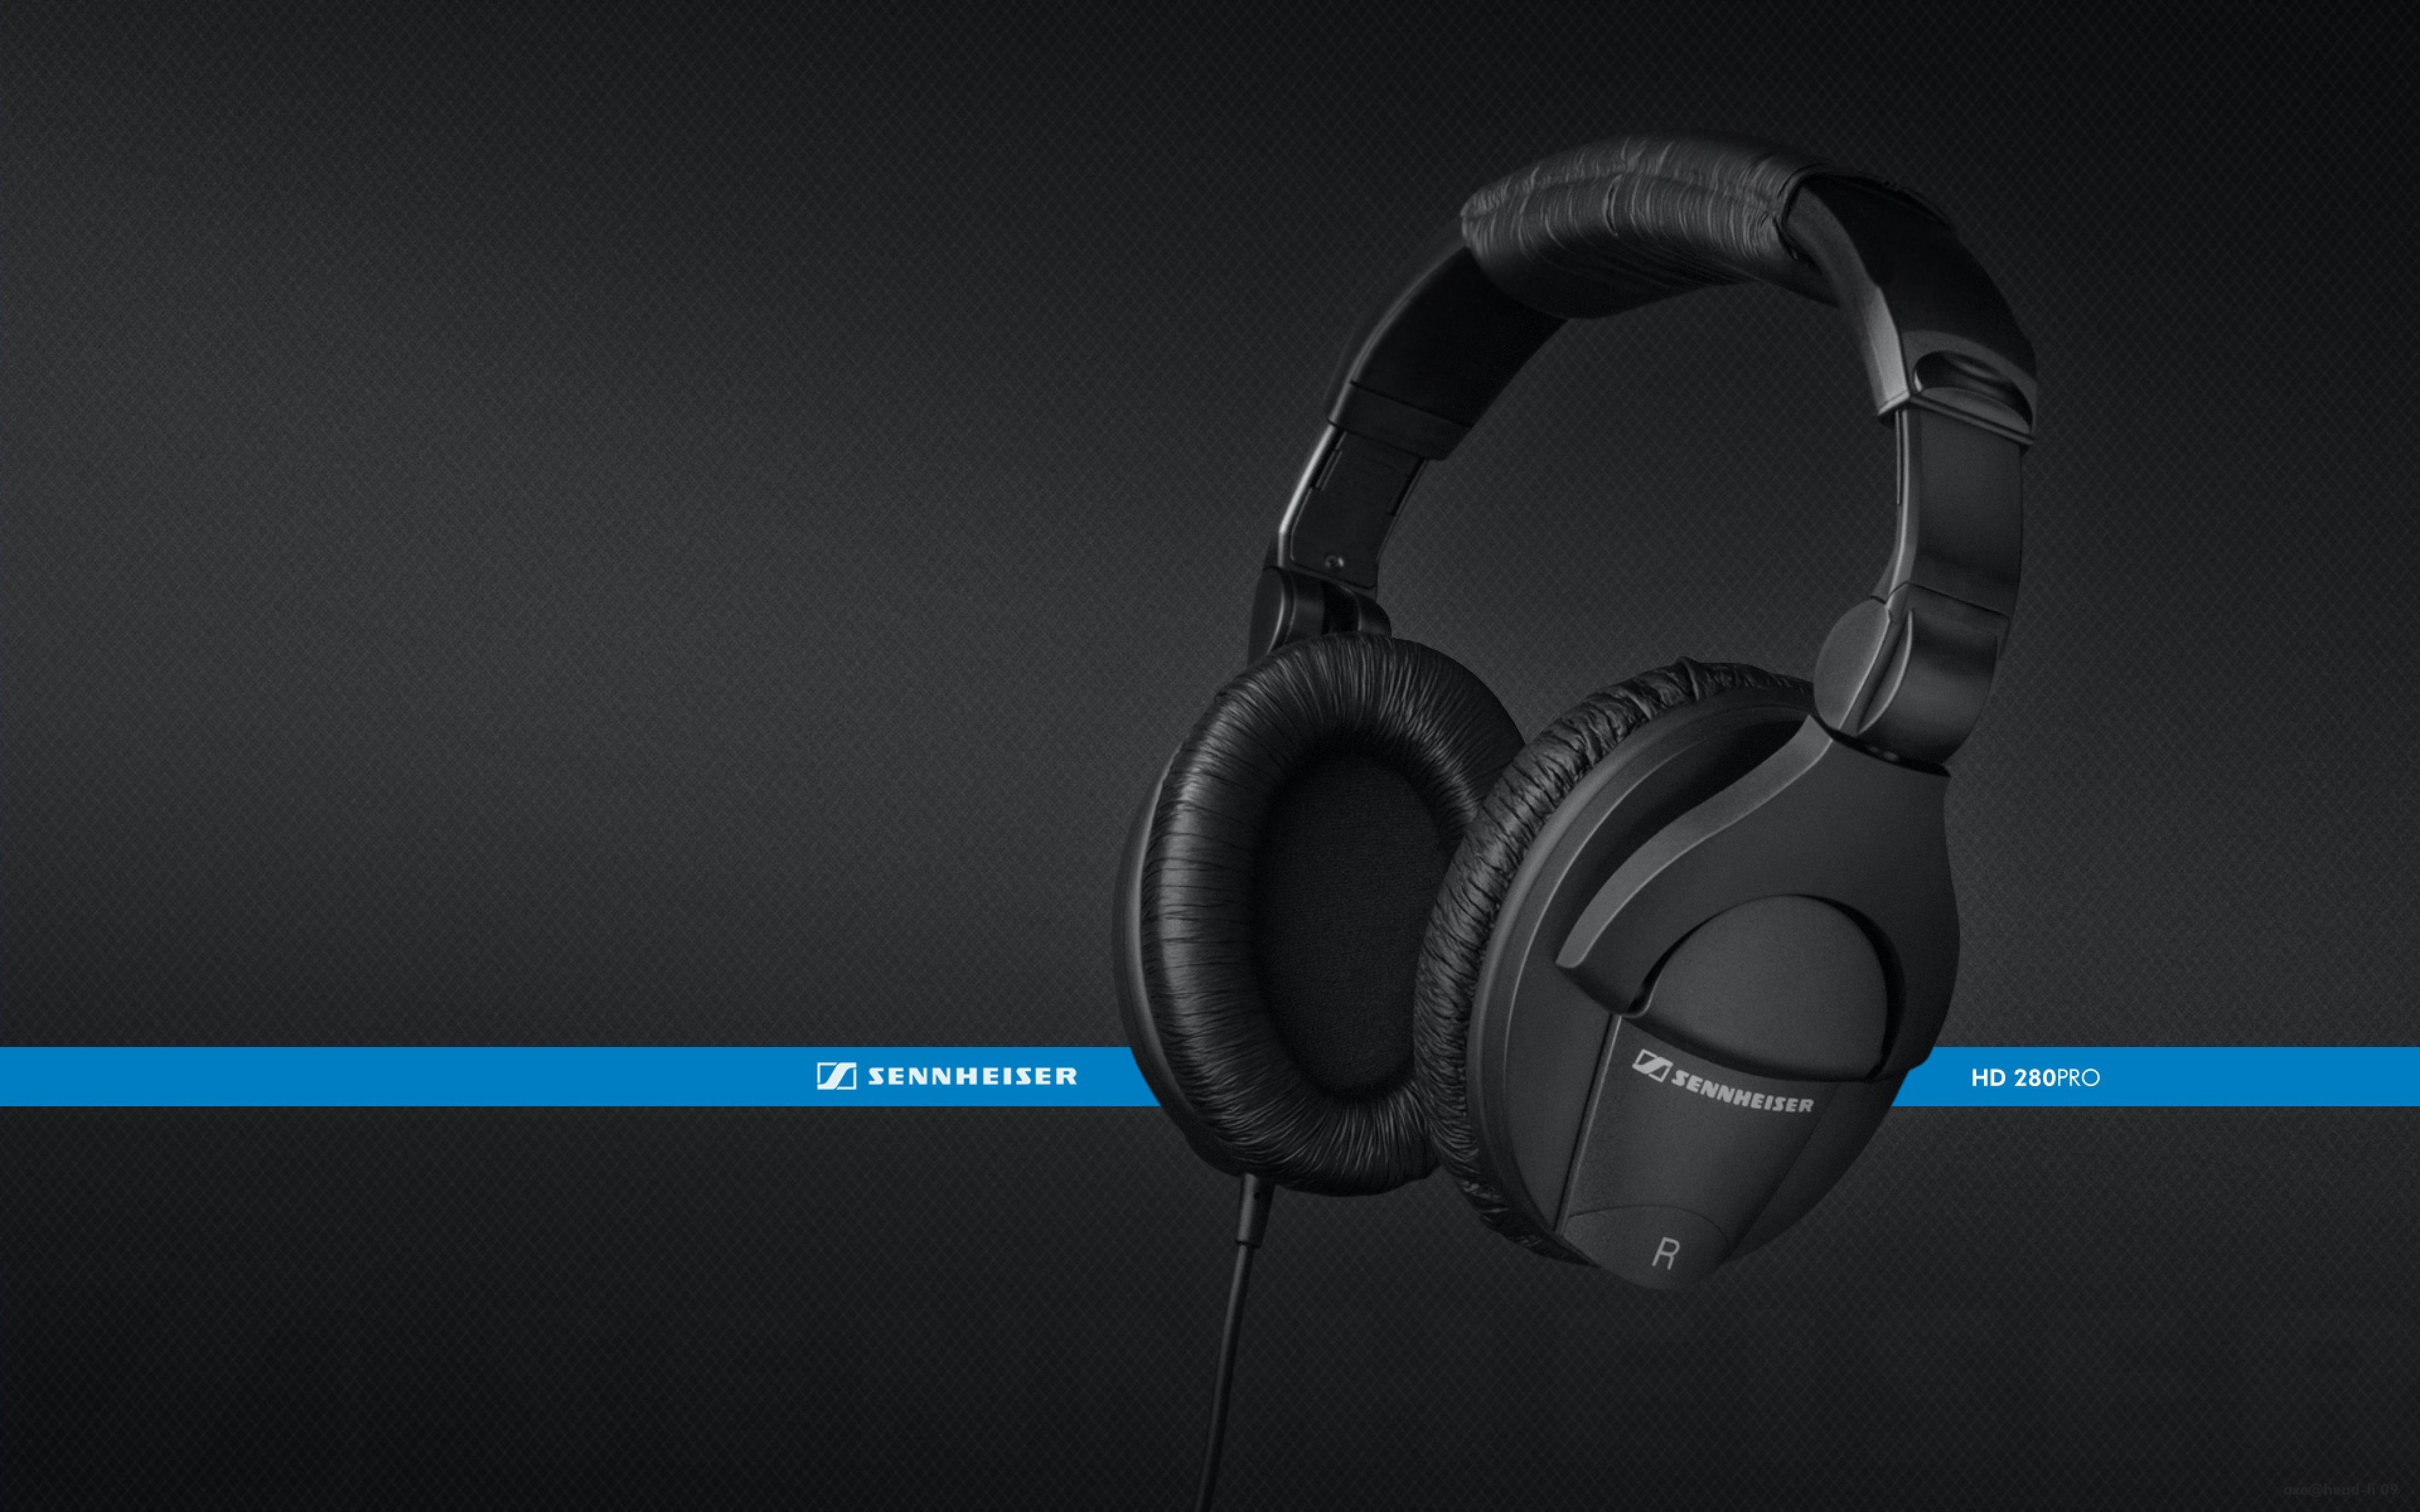 3840x2400 Wallpaper headphones, sennheiser, hd280pro, background, black